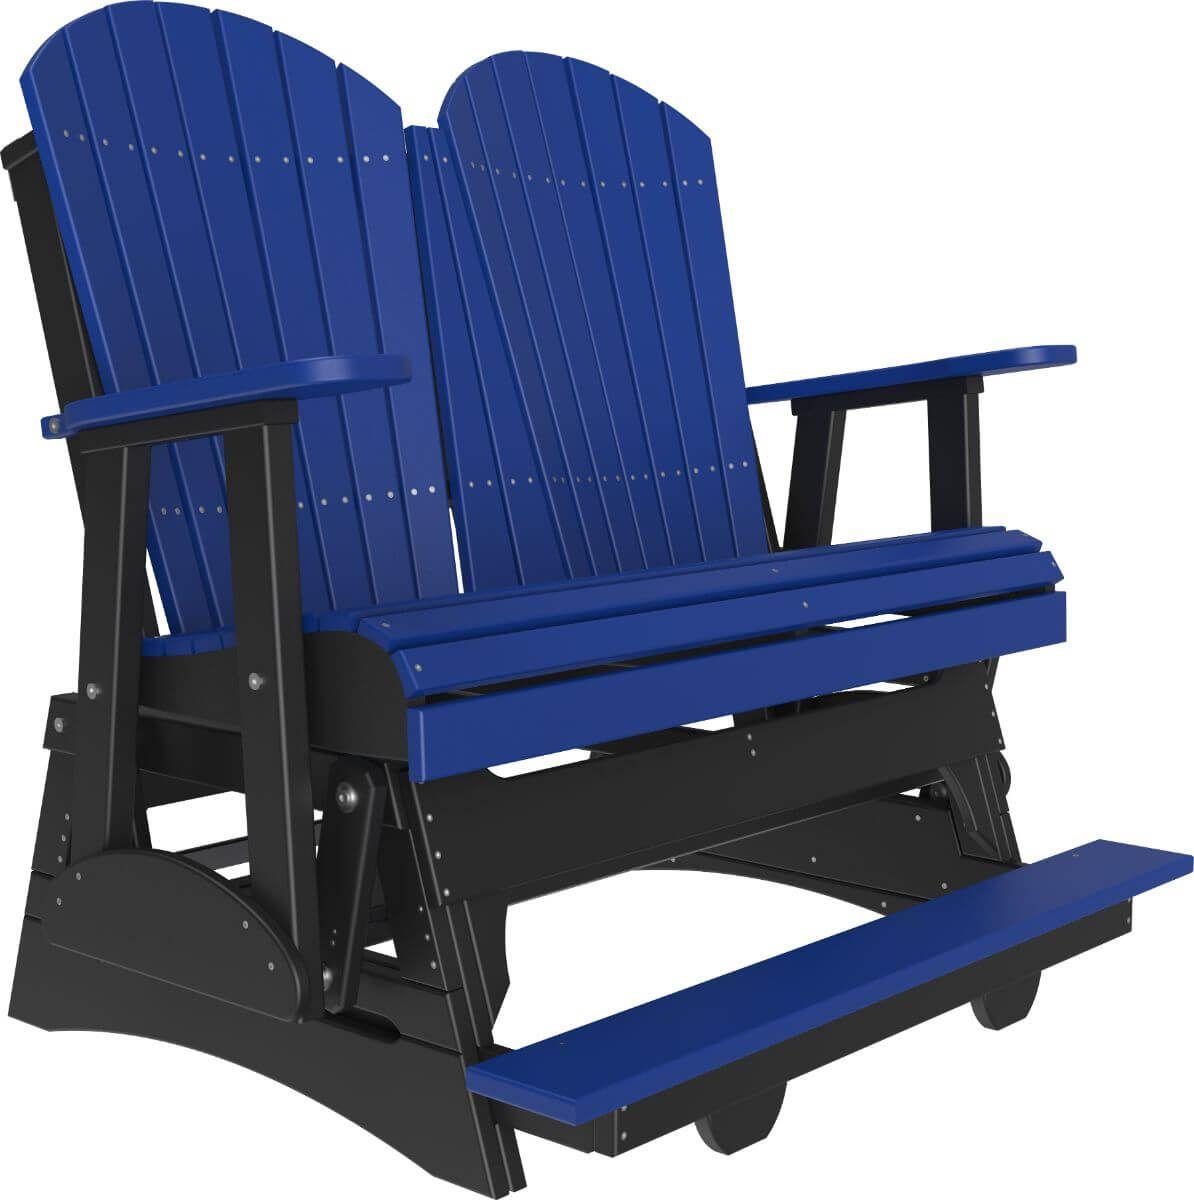 Blue and Black Tahiti Loveseat Balcony Glider